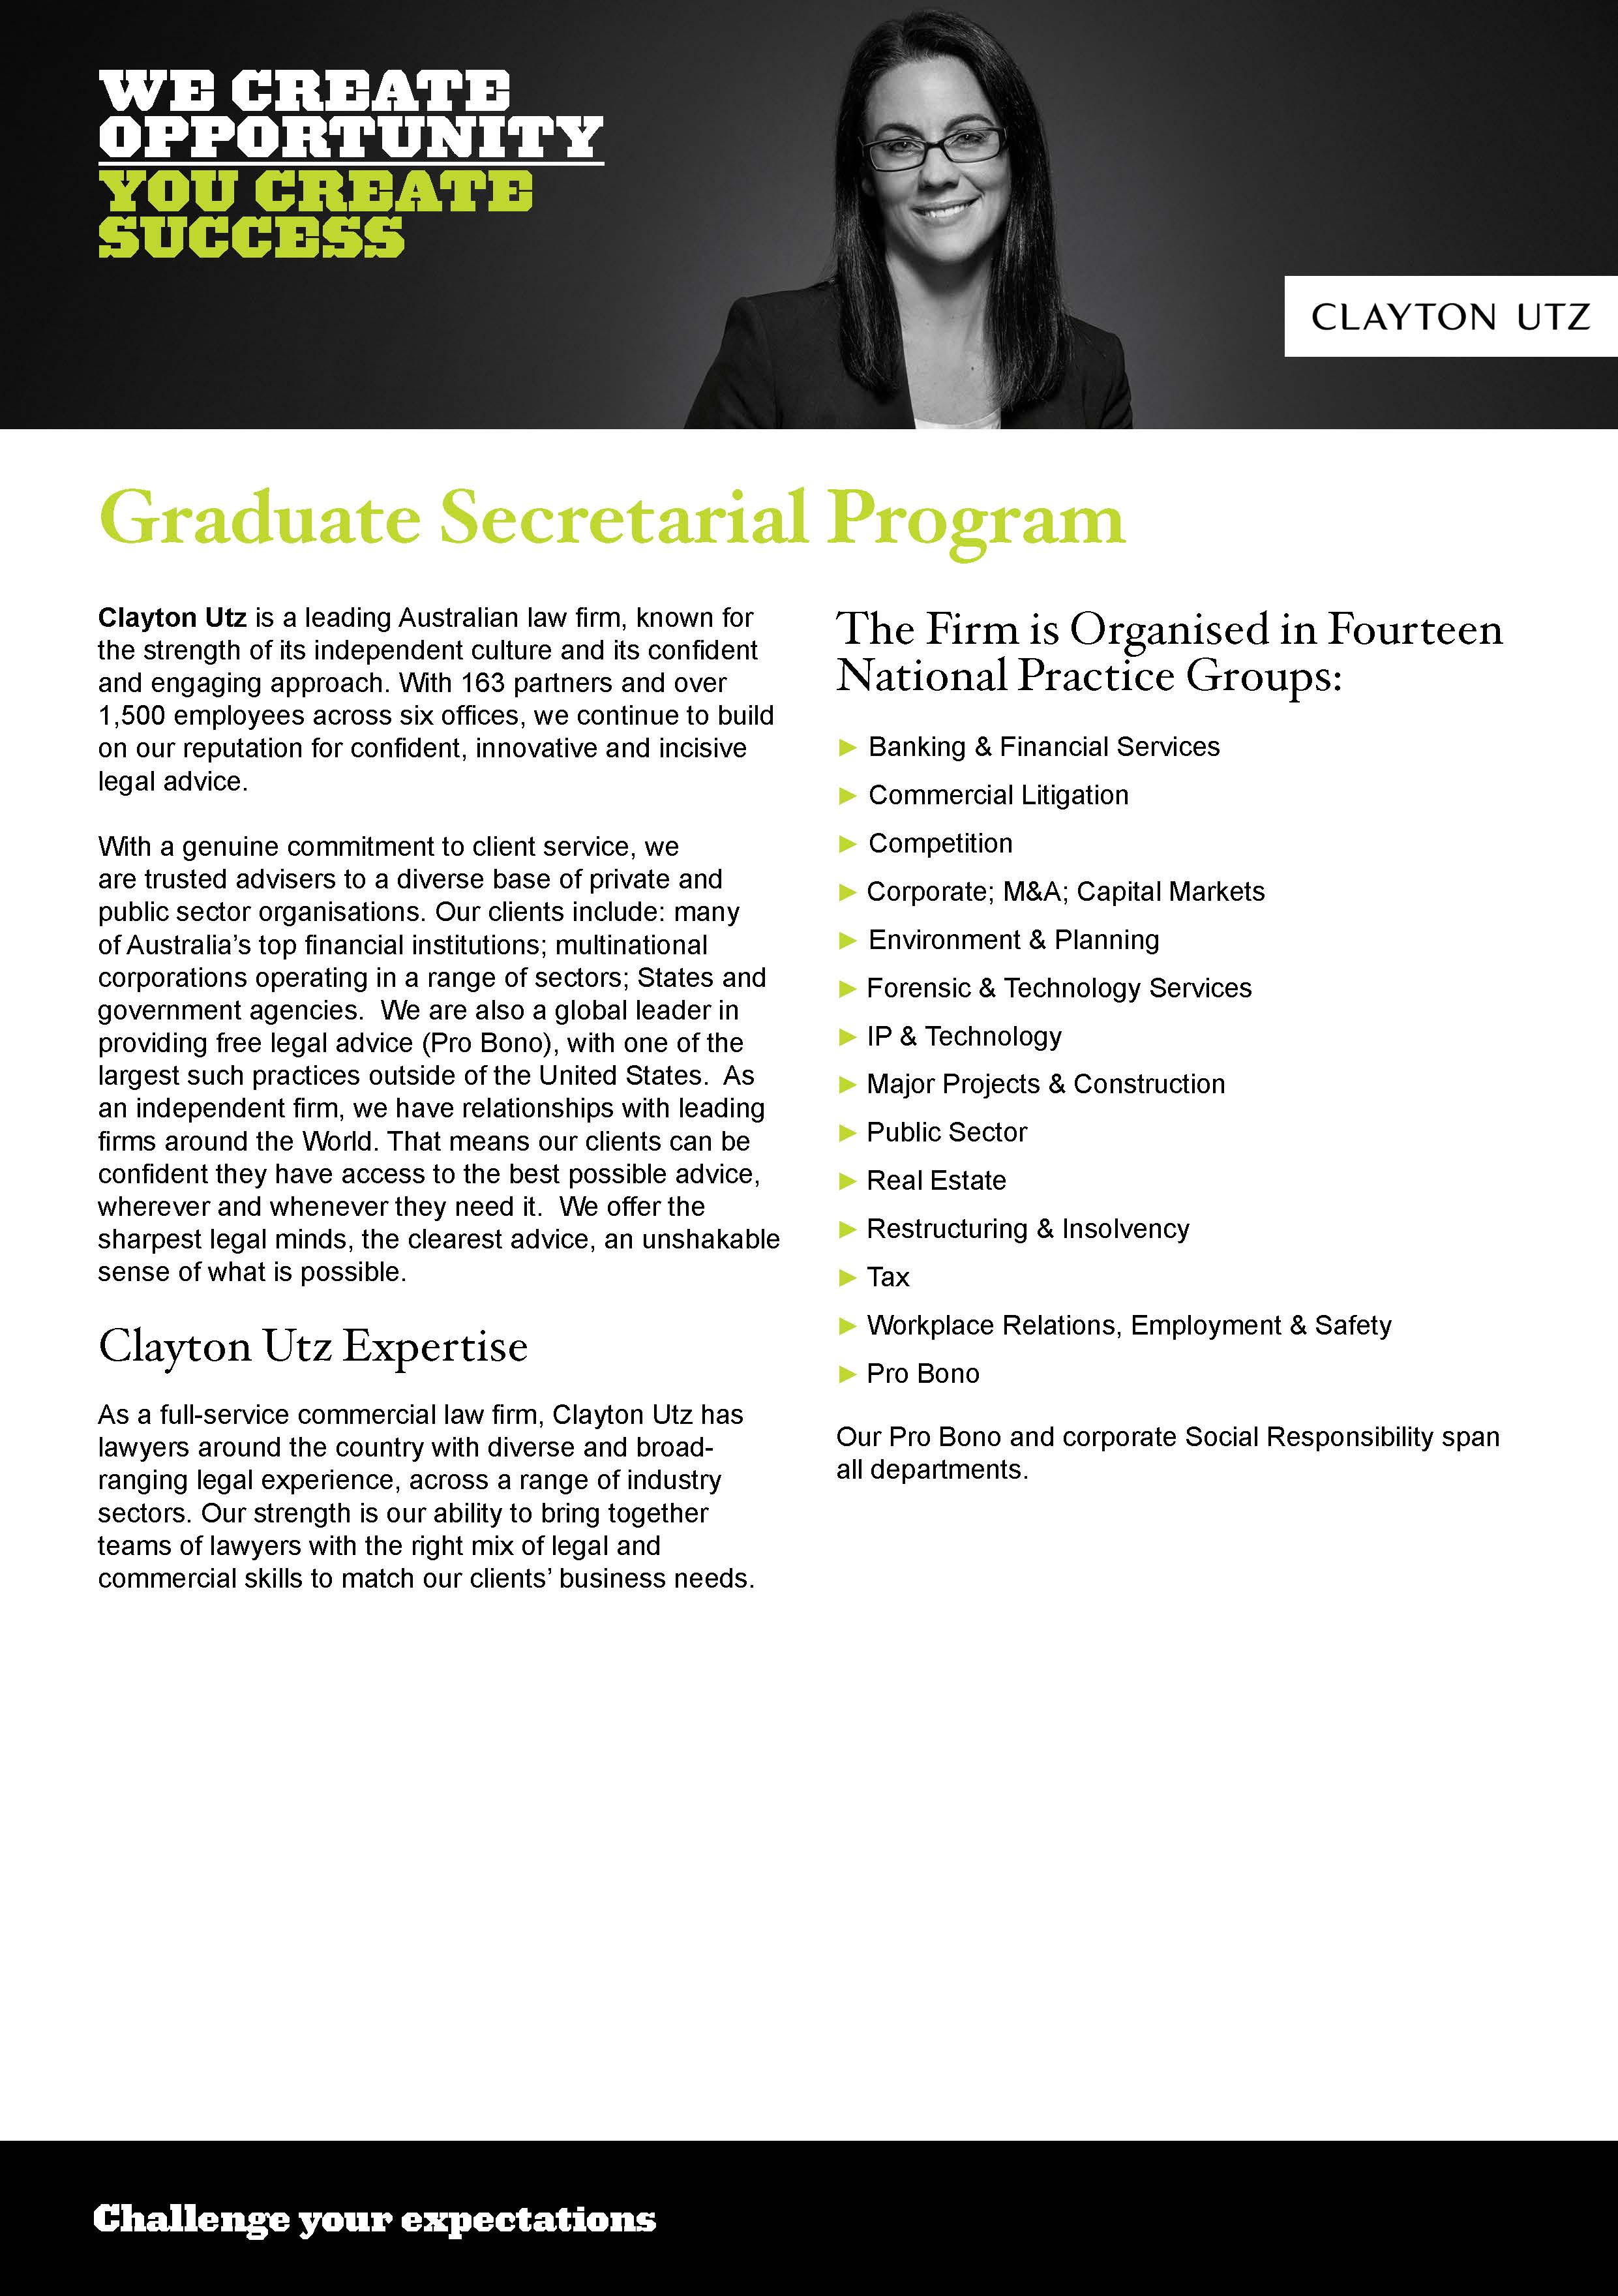 Clayton Utz Graduate_Secretarial_Program_Sydney_2019_Page_1.jpg